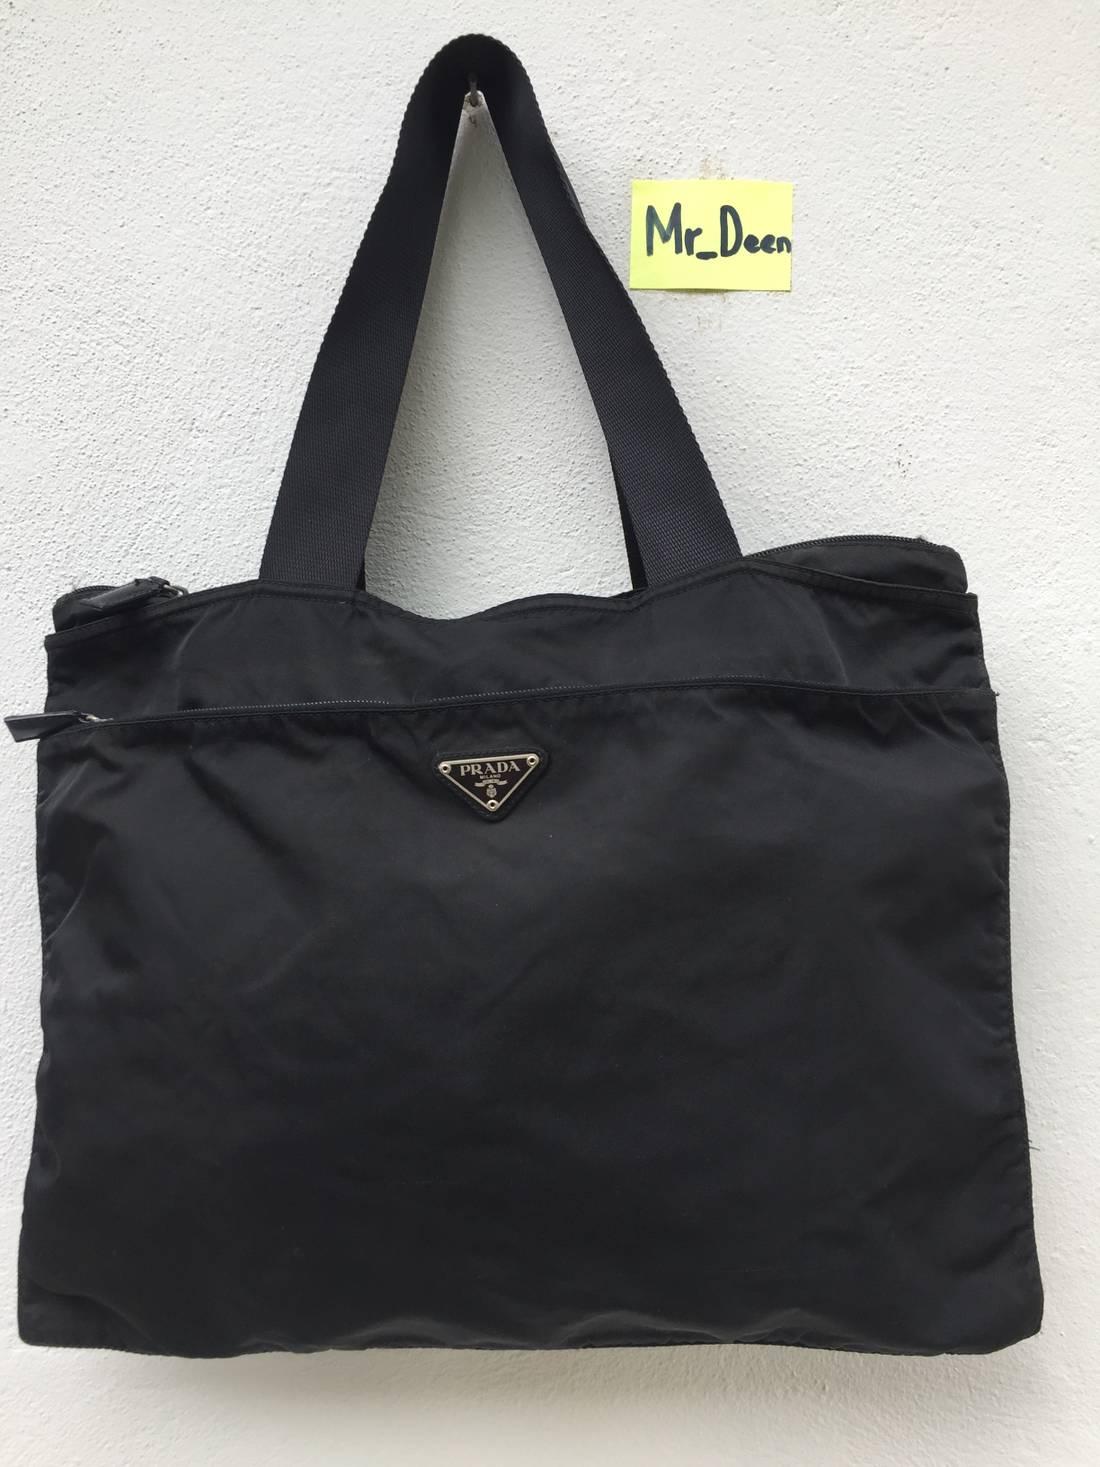 5faefdfb79b1 ... switzerland prada authentic prada tote bag nylon size one size 6f17a  34a78